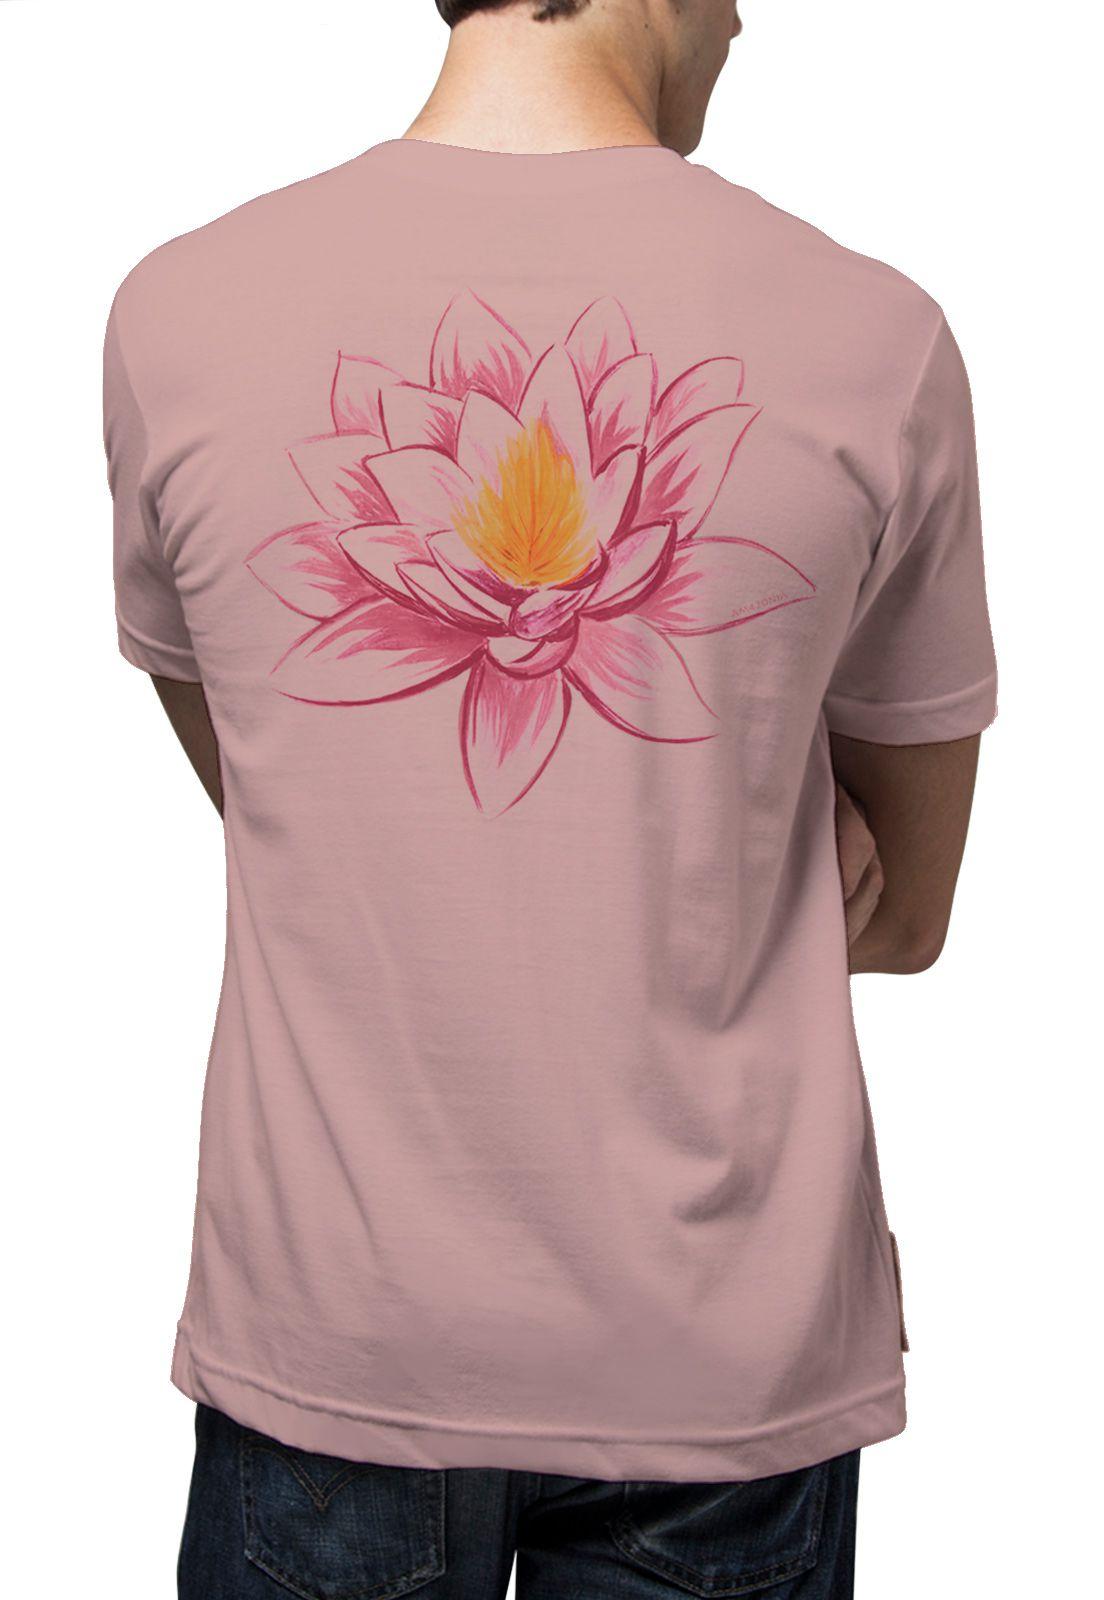 Camiseta Amazônia Flor de Lotus - Rosa